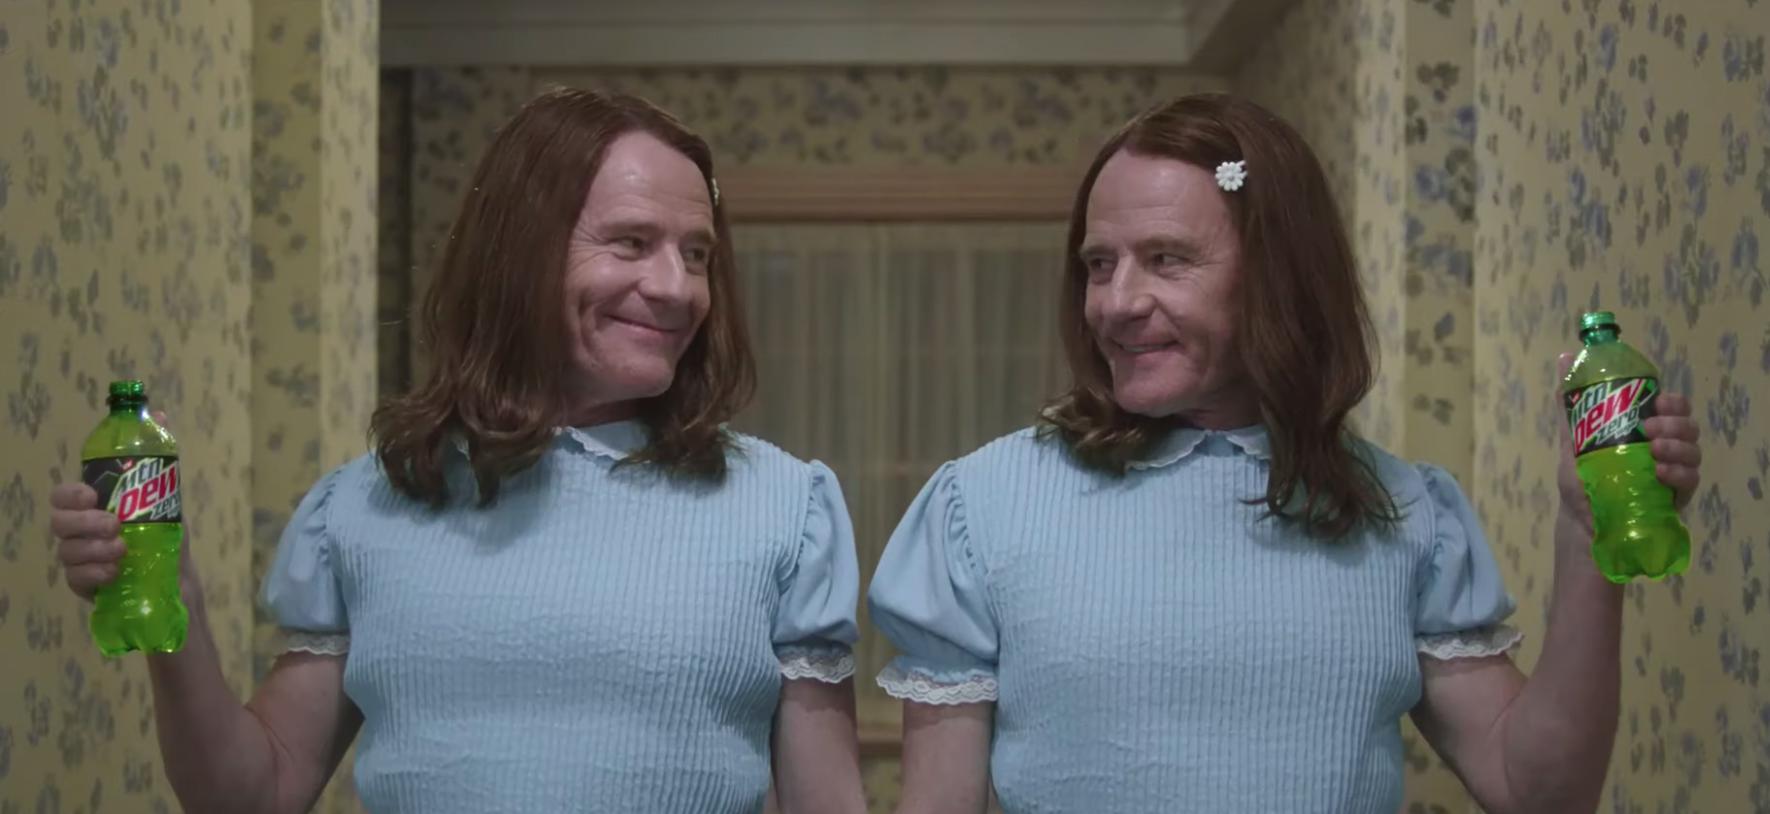 Bryan Cranston Recreates 'The Shining' In Super Bowl Ad Creepier Than The Original Stanley Kubrick Movie